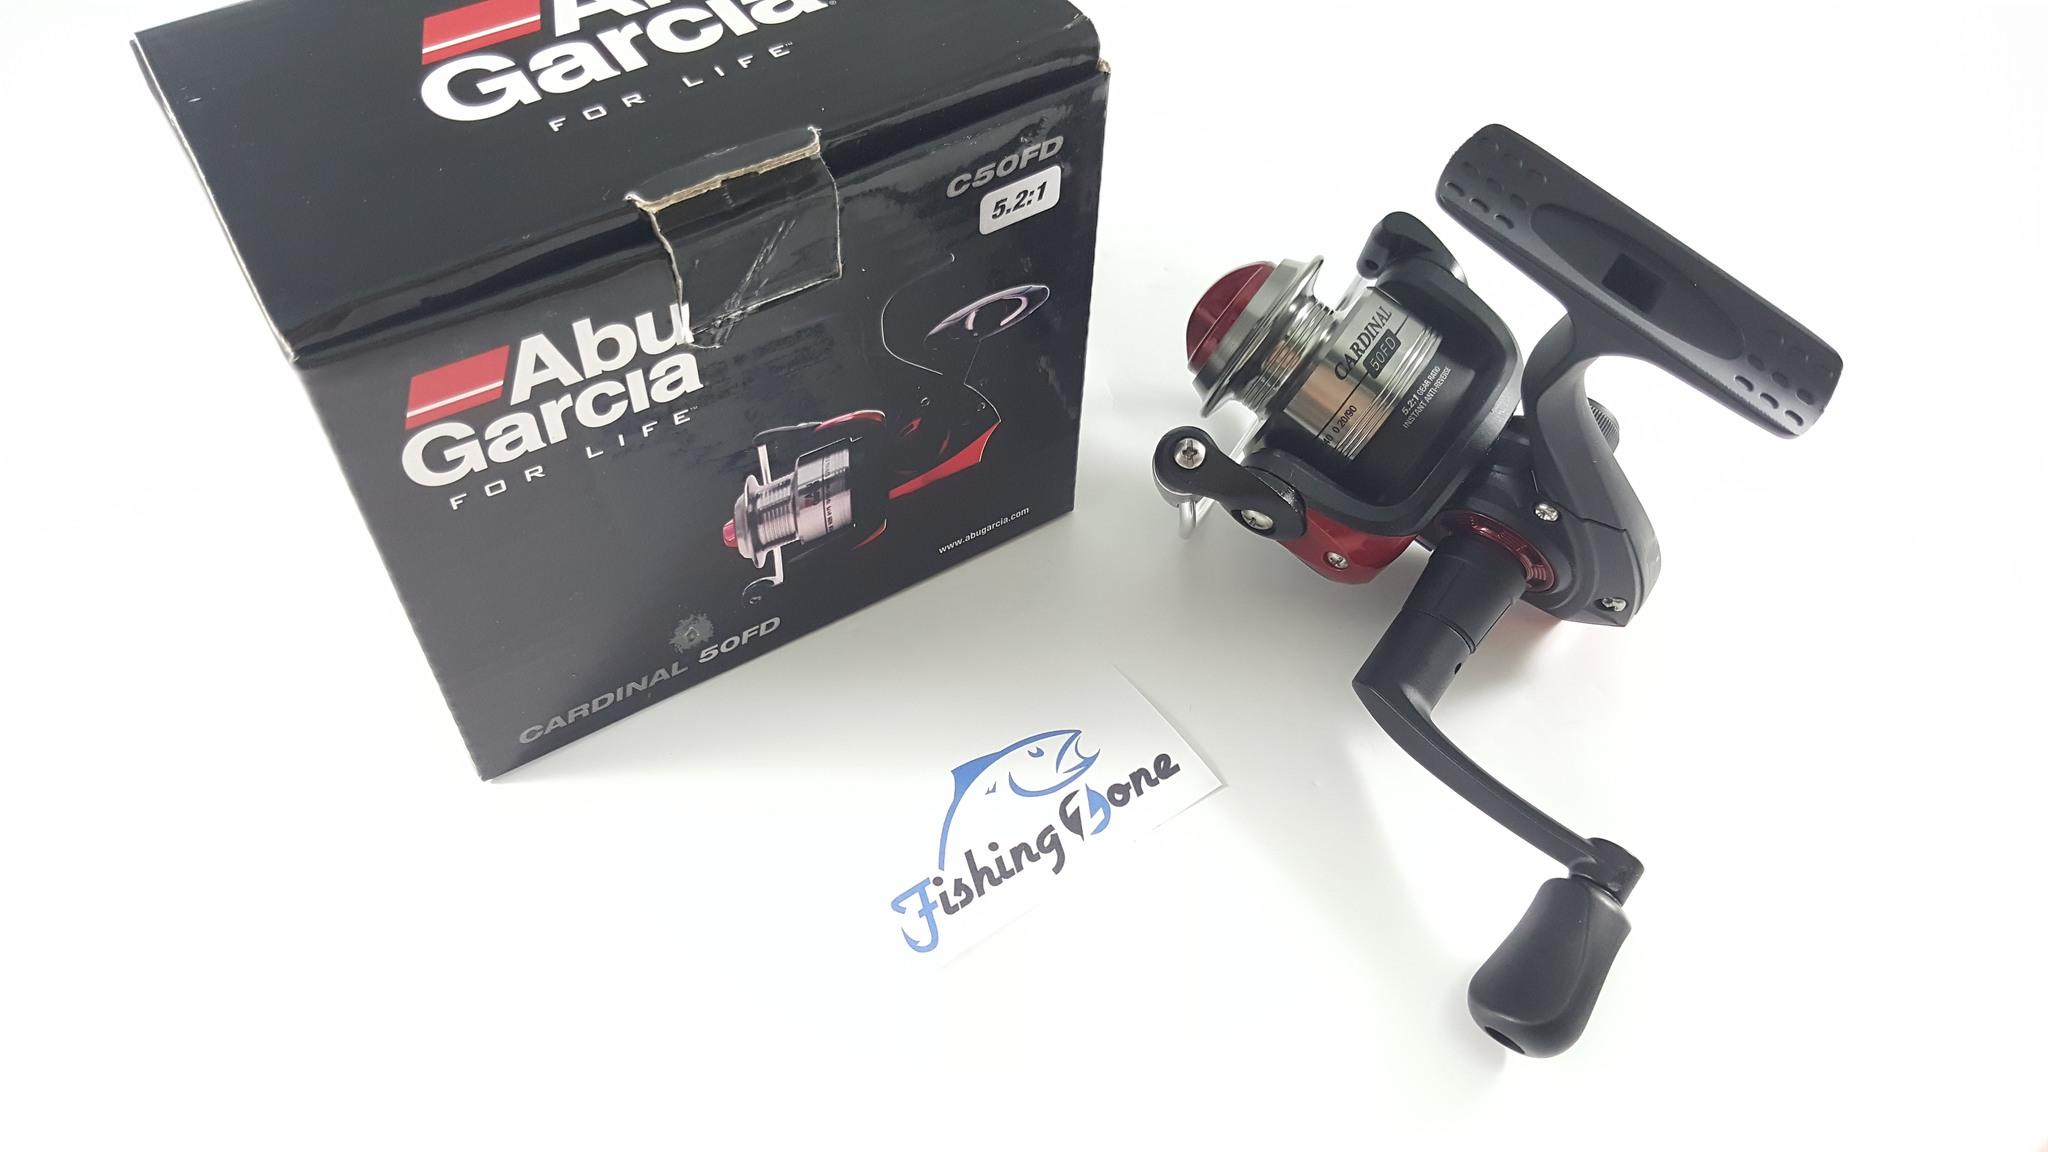 harga Alat Pancing Abu Garcia Cardinal 50 Fd Spinning Reel - 500 Blanja.com